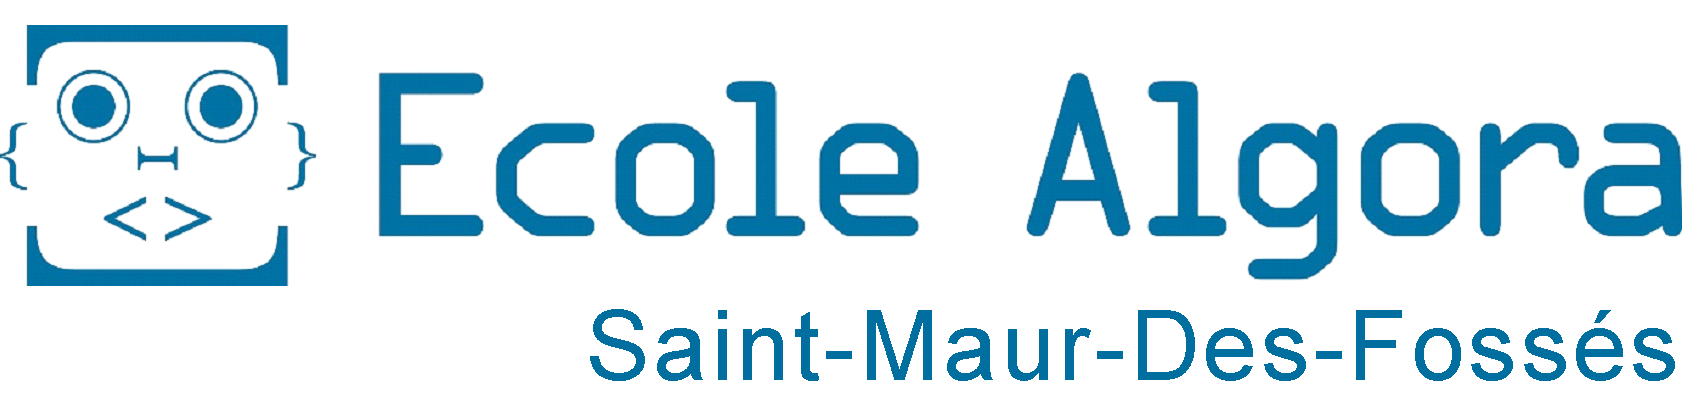 Algora Saint-Maur-des-Fossés